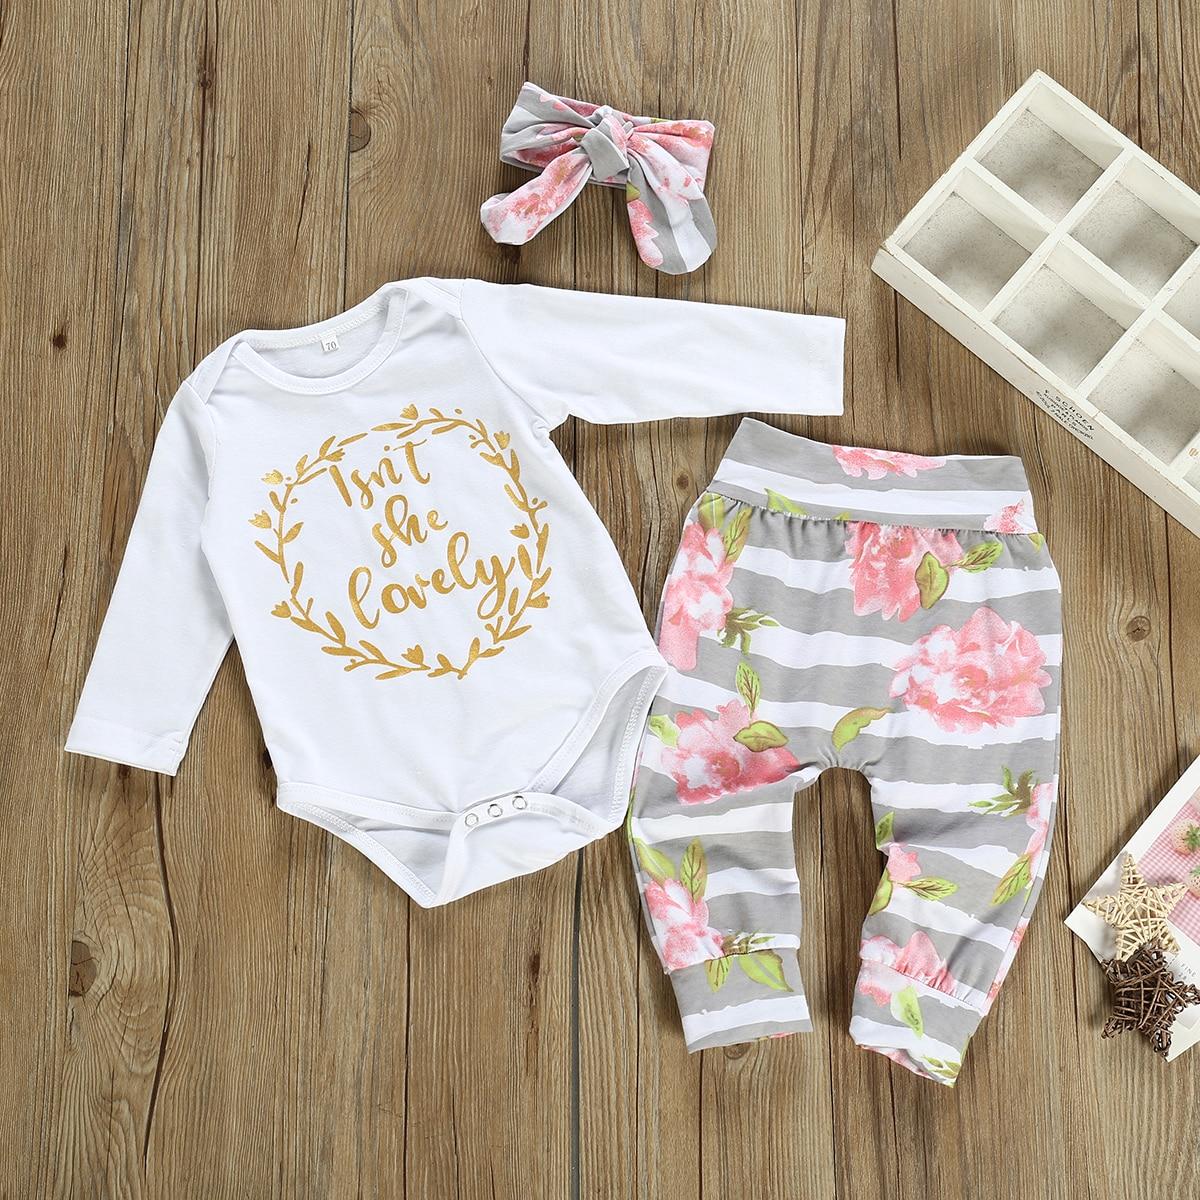 Newborn Baby Girls 0-12M Clothes 3Pcs Romper Tops Flower Pants Headband Outfits